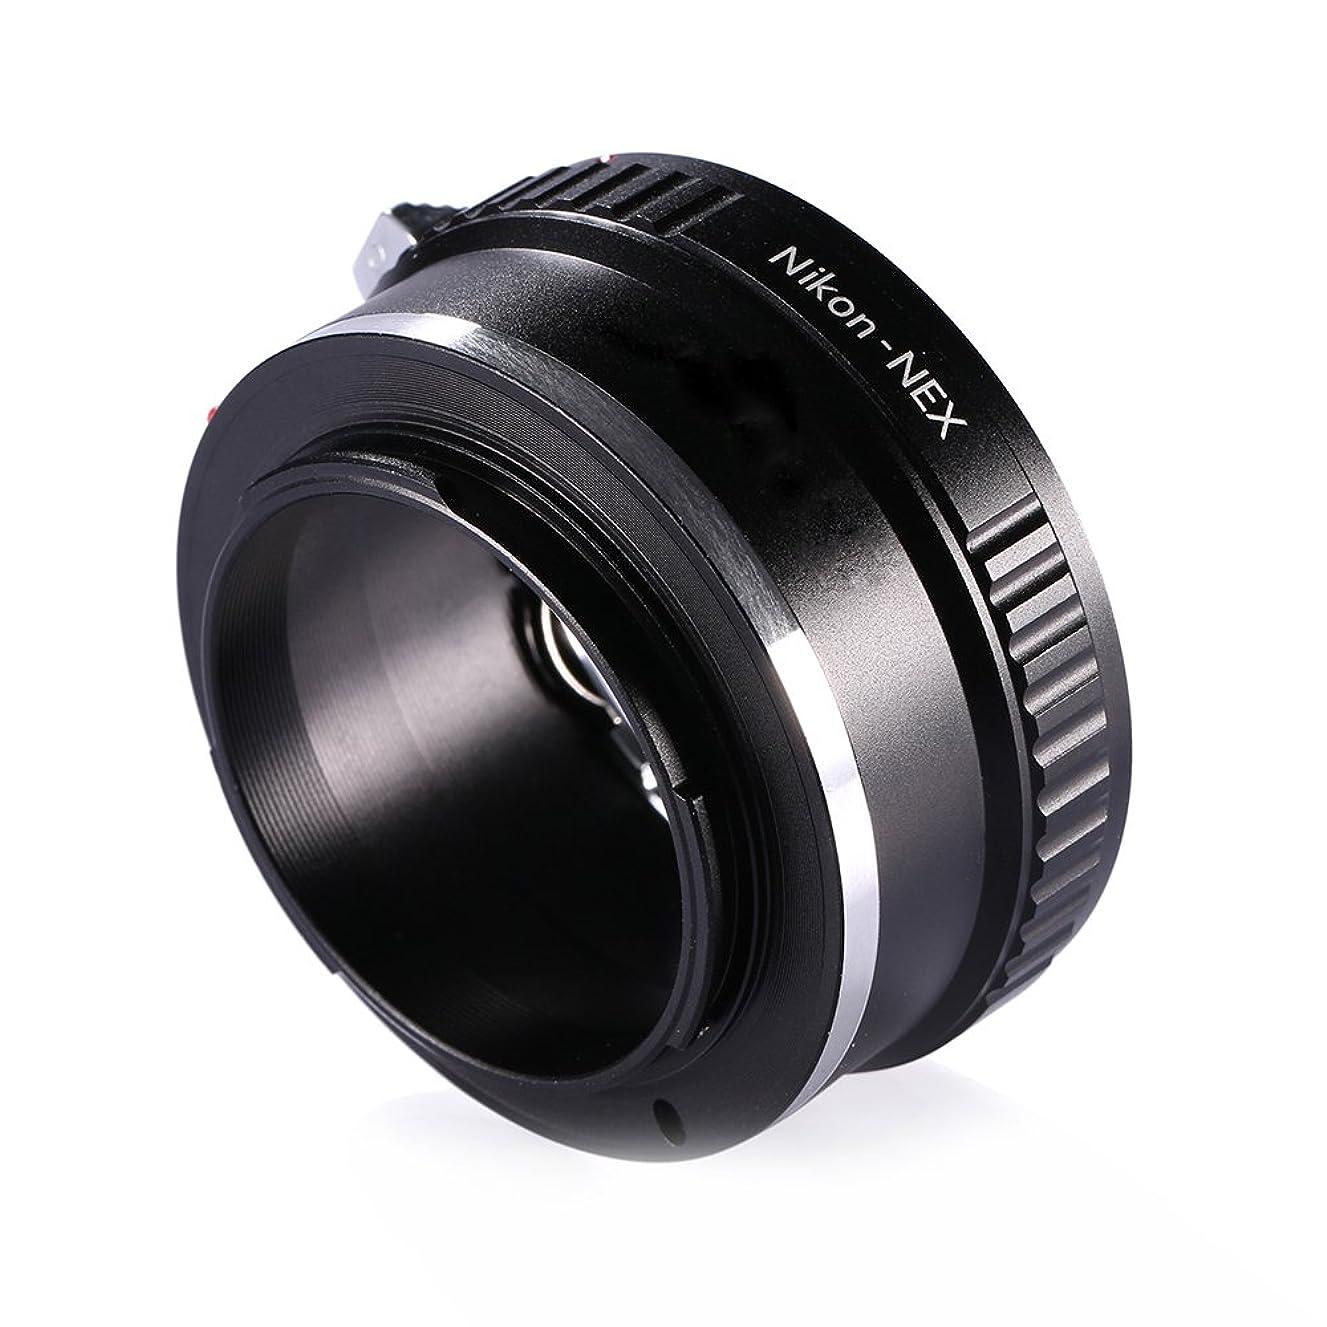 Adapter To Convert Nikon F-Mount Lens To E-mount / NEX For Alpha Sony a7, a7S, a7IIK, a7II, a7R II, a6500, a6300, a6000, a5000, a5100, a3000 Mirrorless Digital Camera